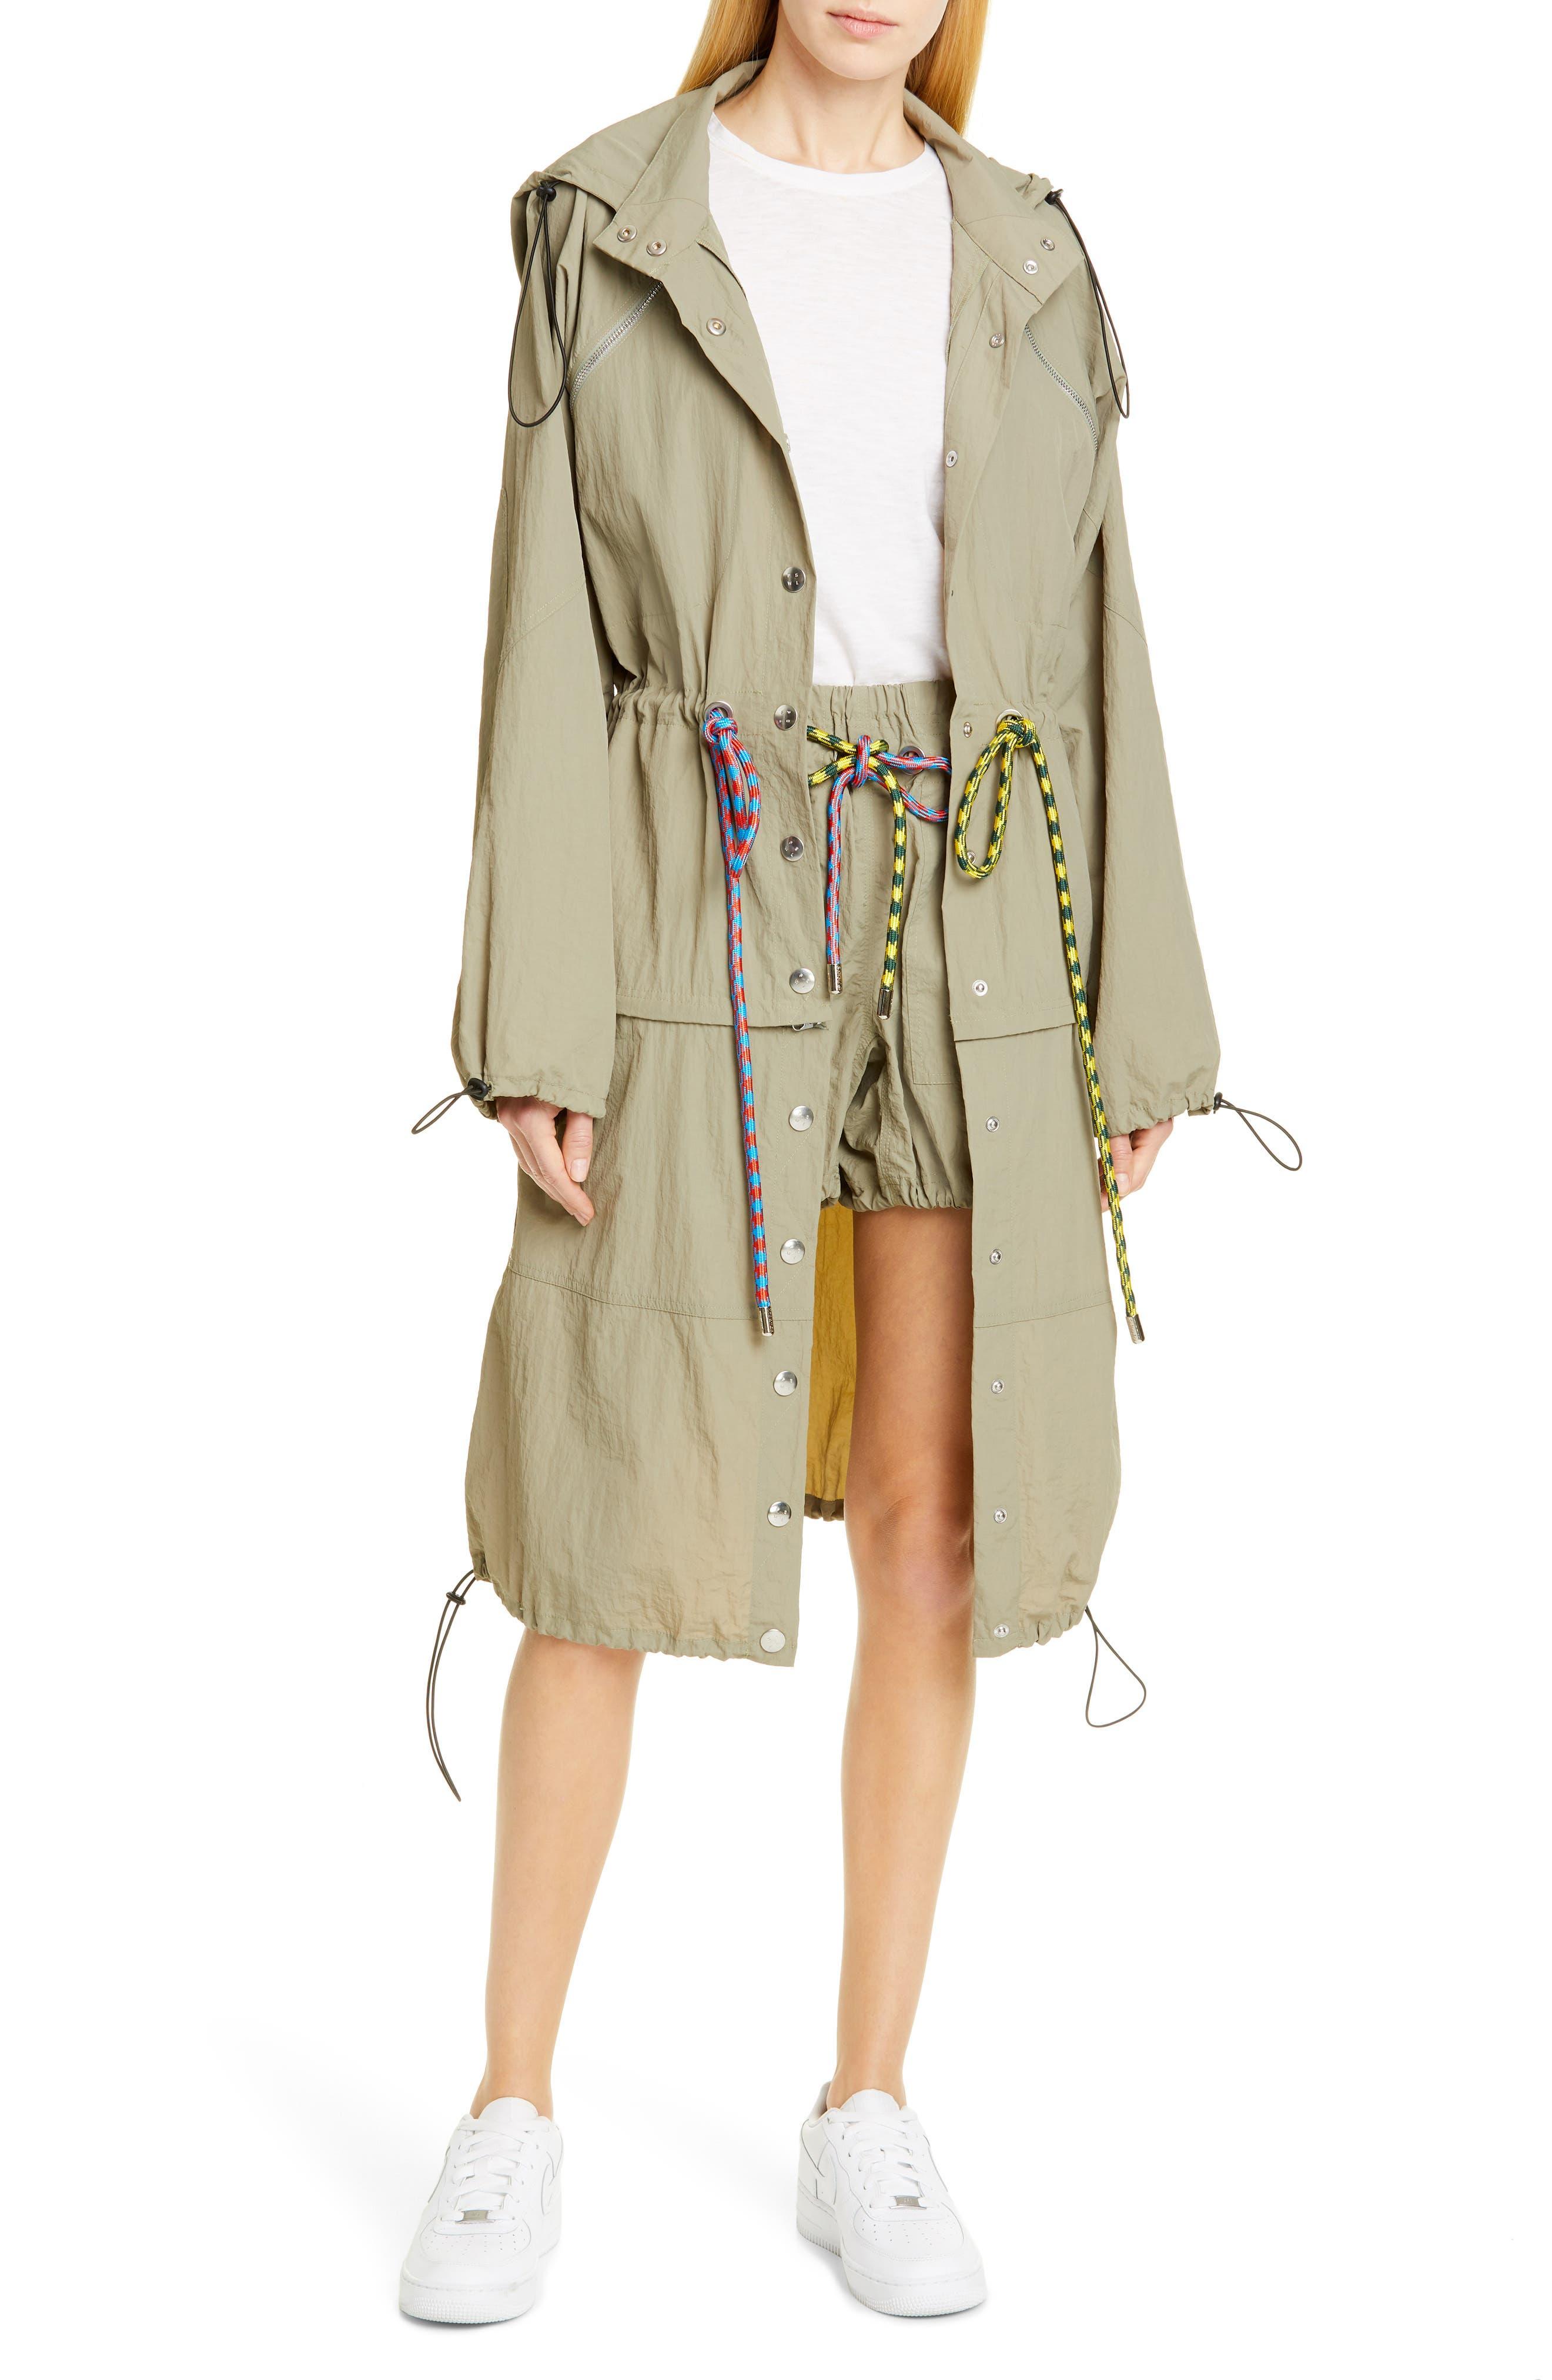 PROENZA SCHOULER, PSWL Drawstring Waist Parachute Shorts, Alternate thumbnail 7, color, MOSS